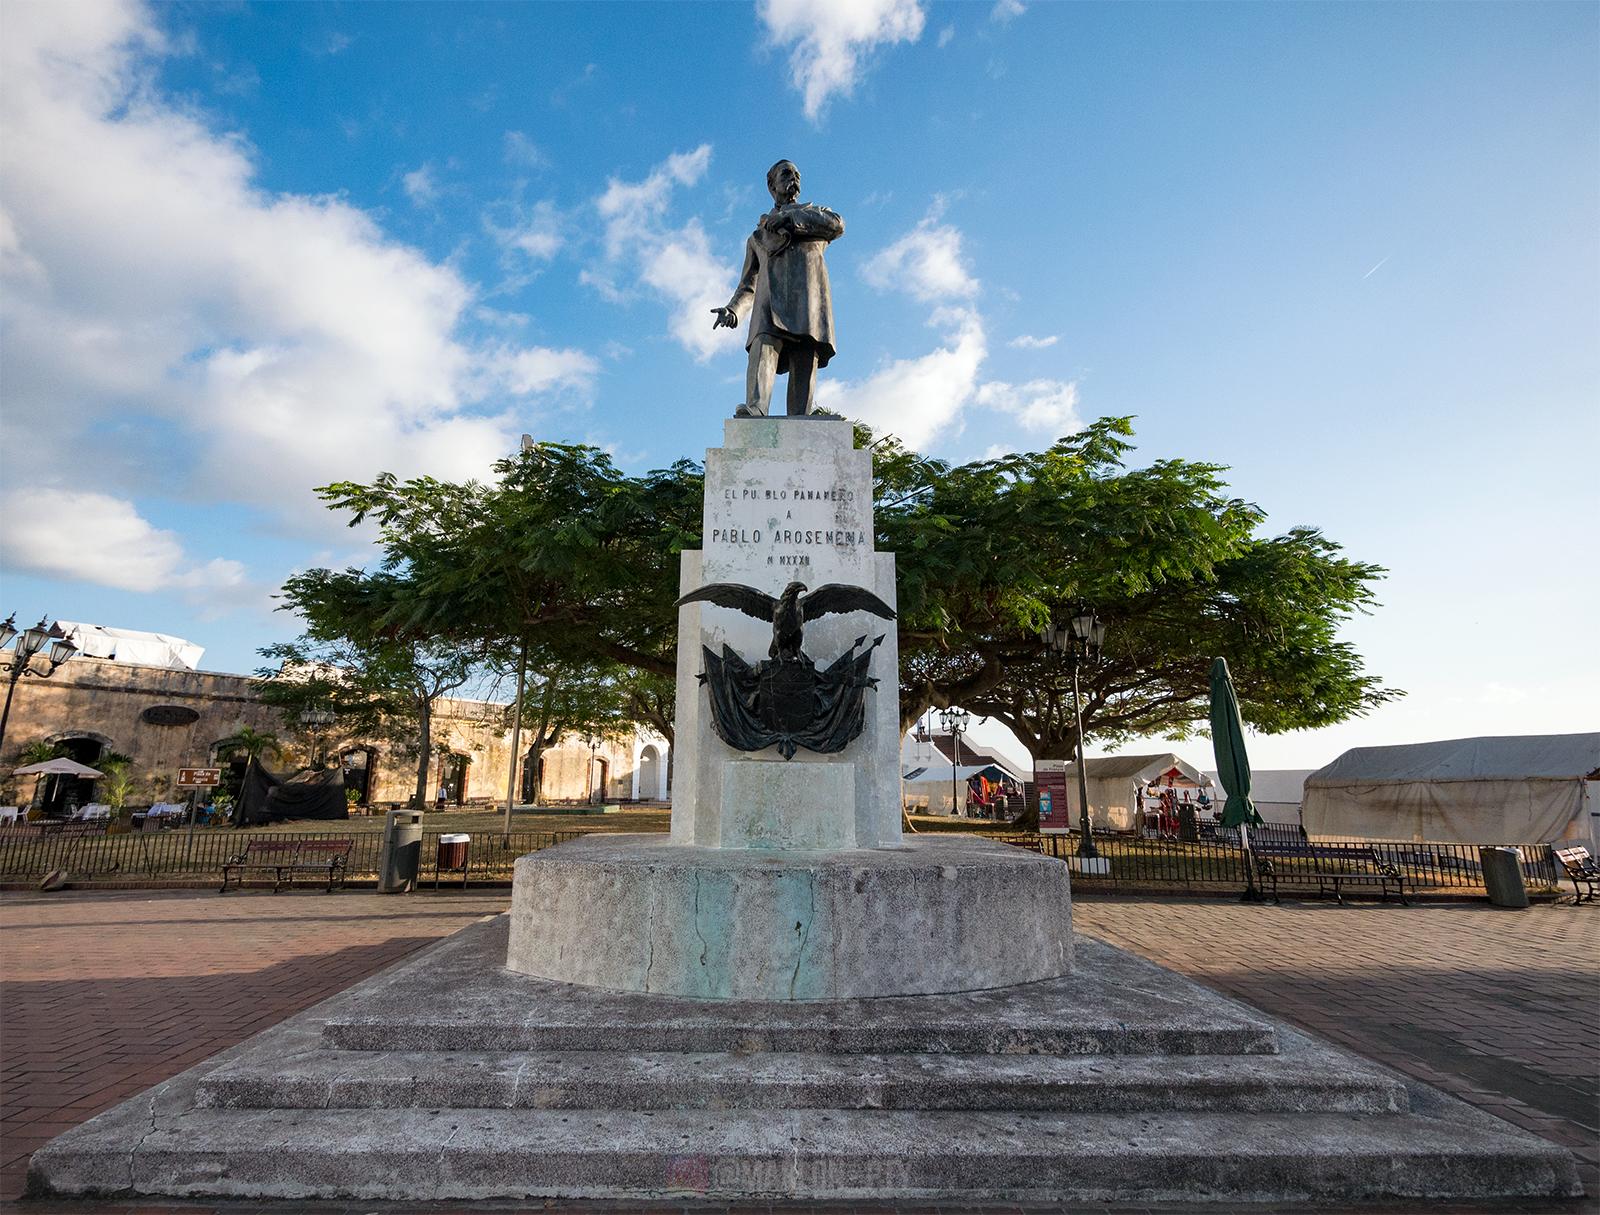 Estatua de Pablo Arosemena en la Plaza de Francia. Photo: Marlon I. Torres